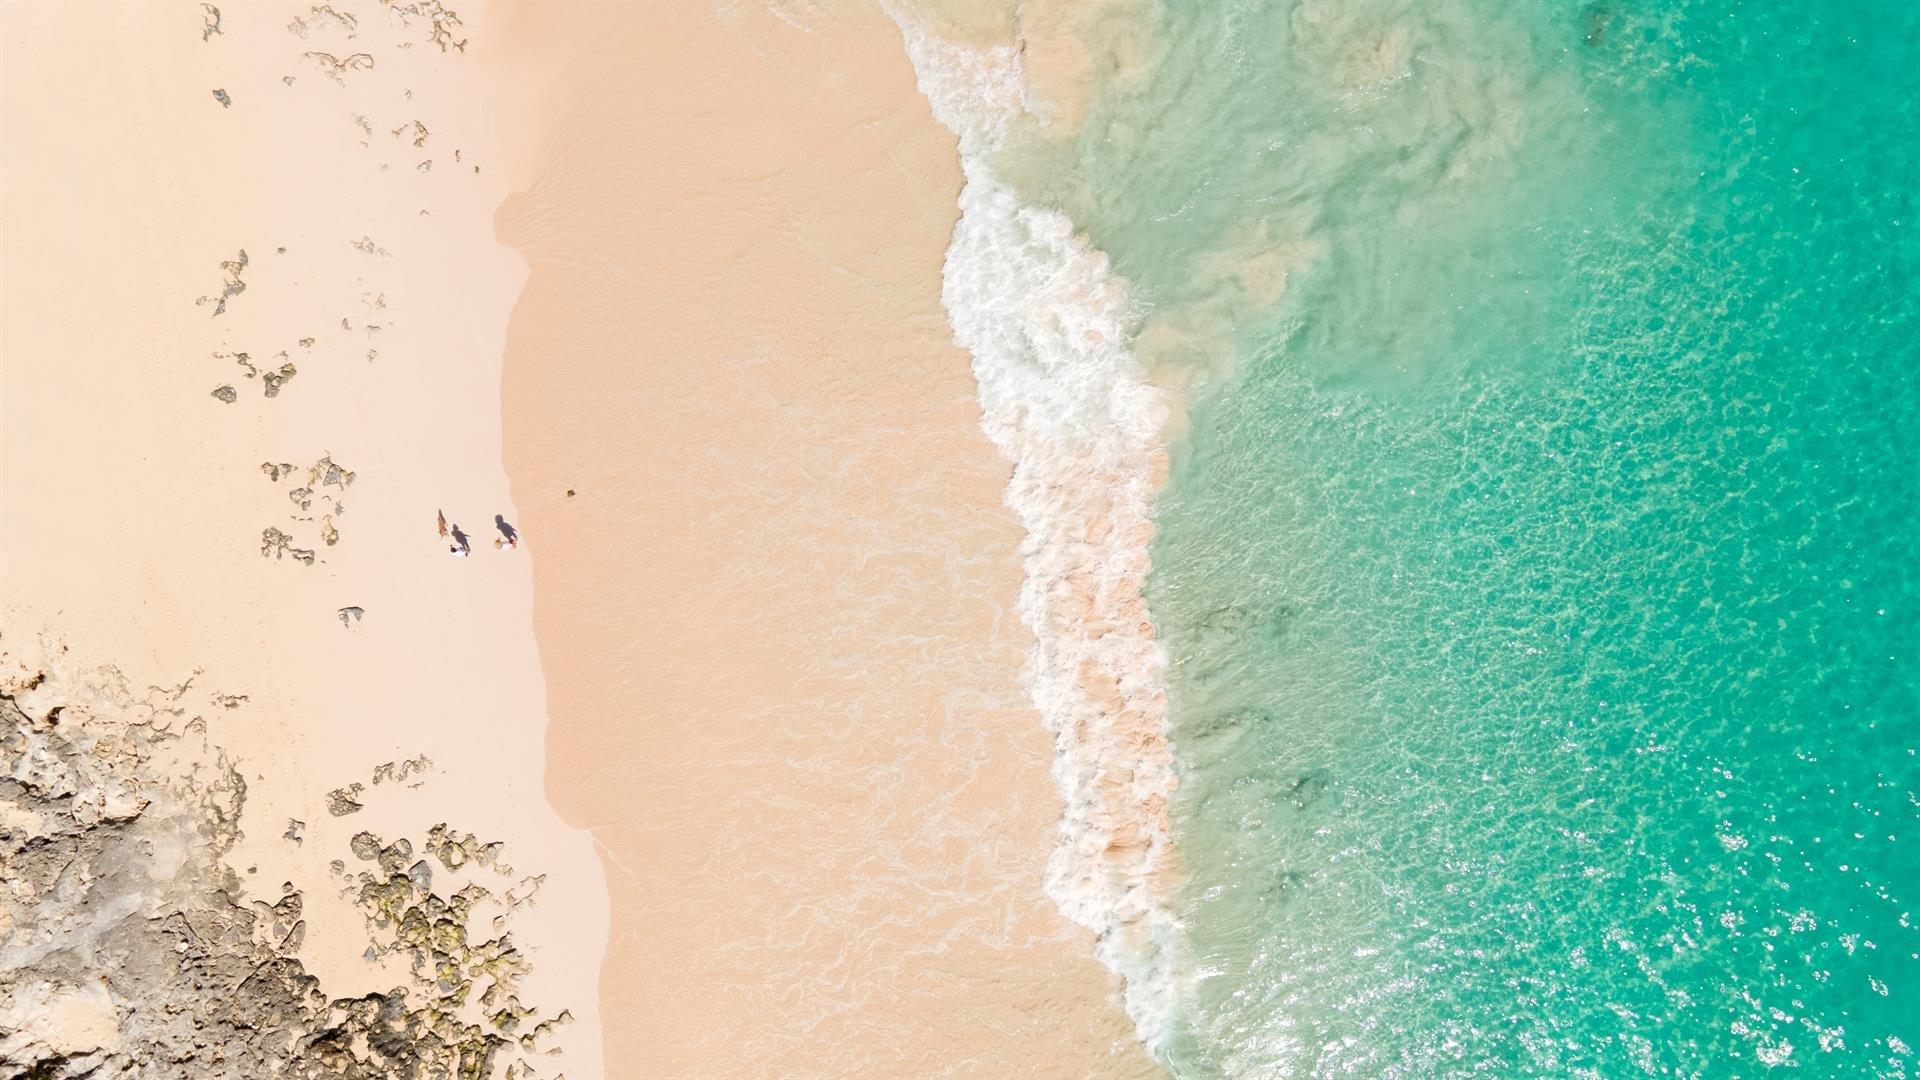 chelston on grape bay beach image41